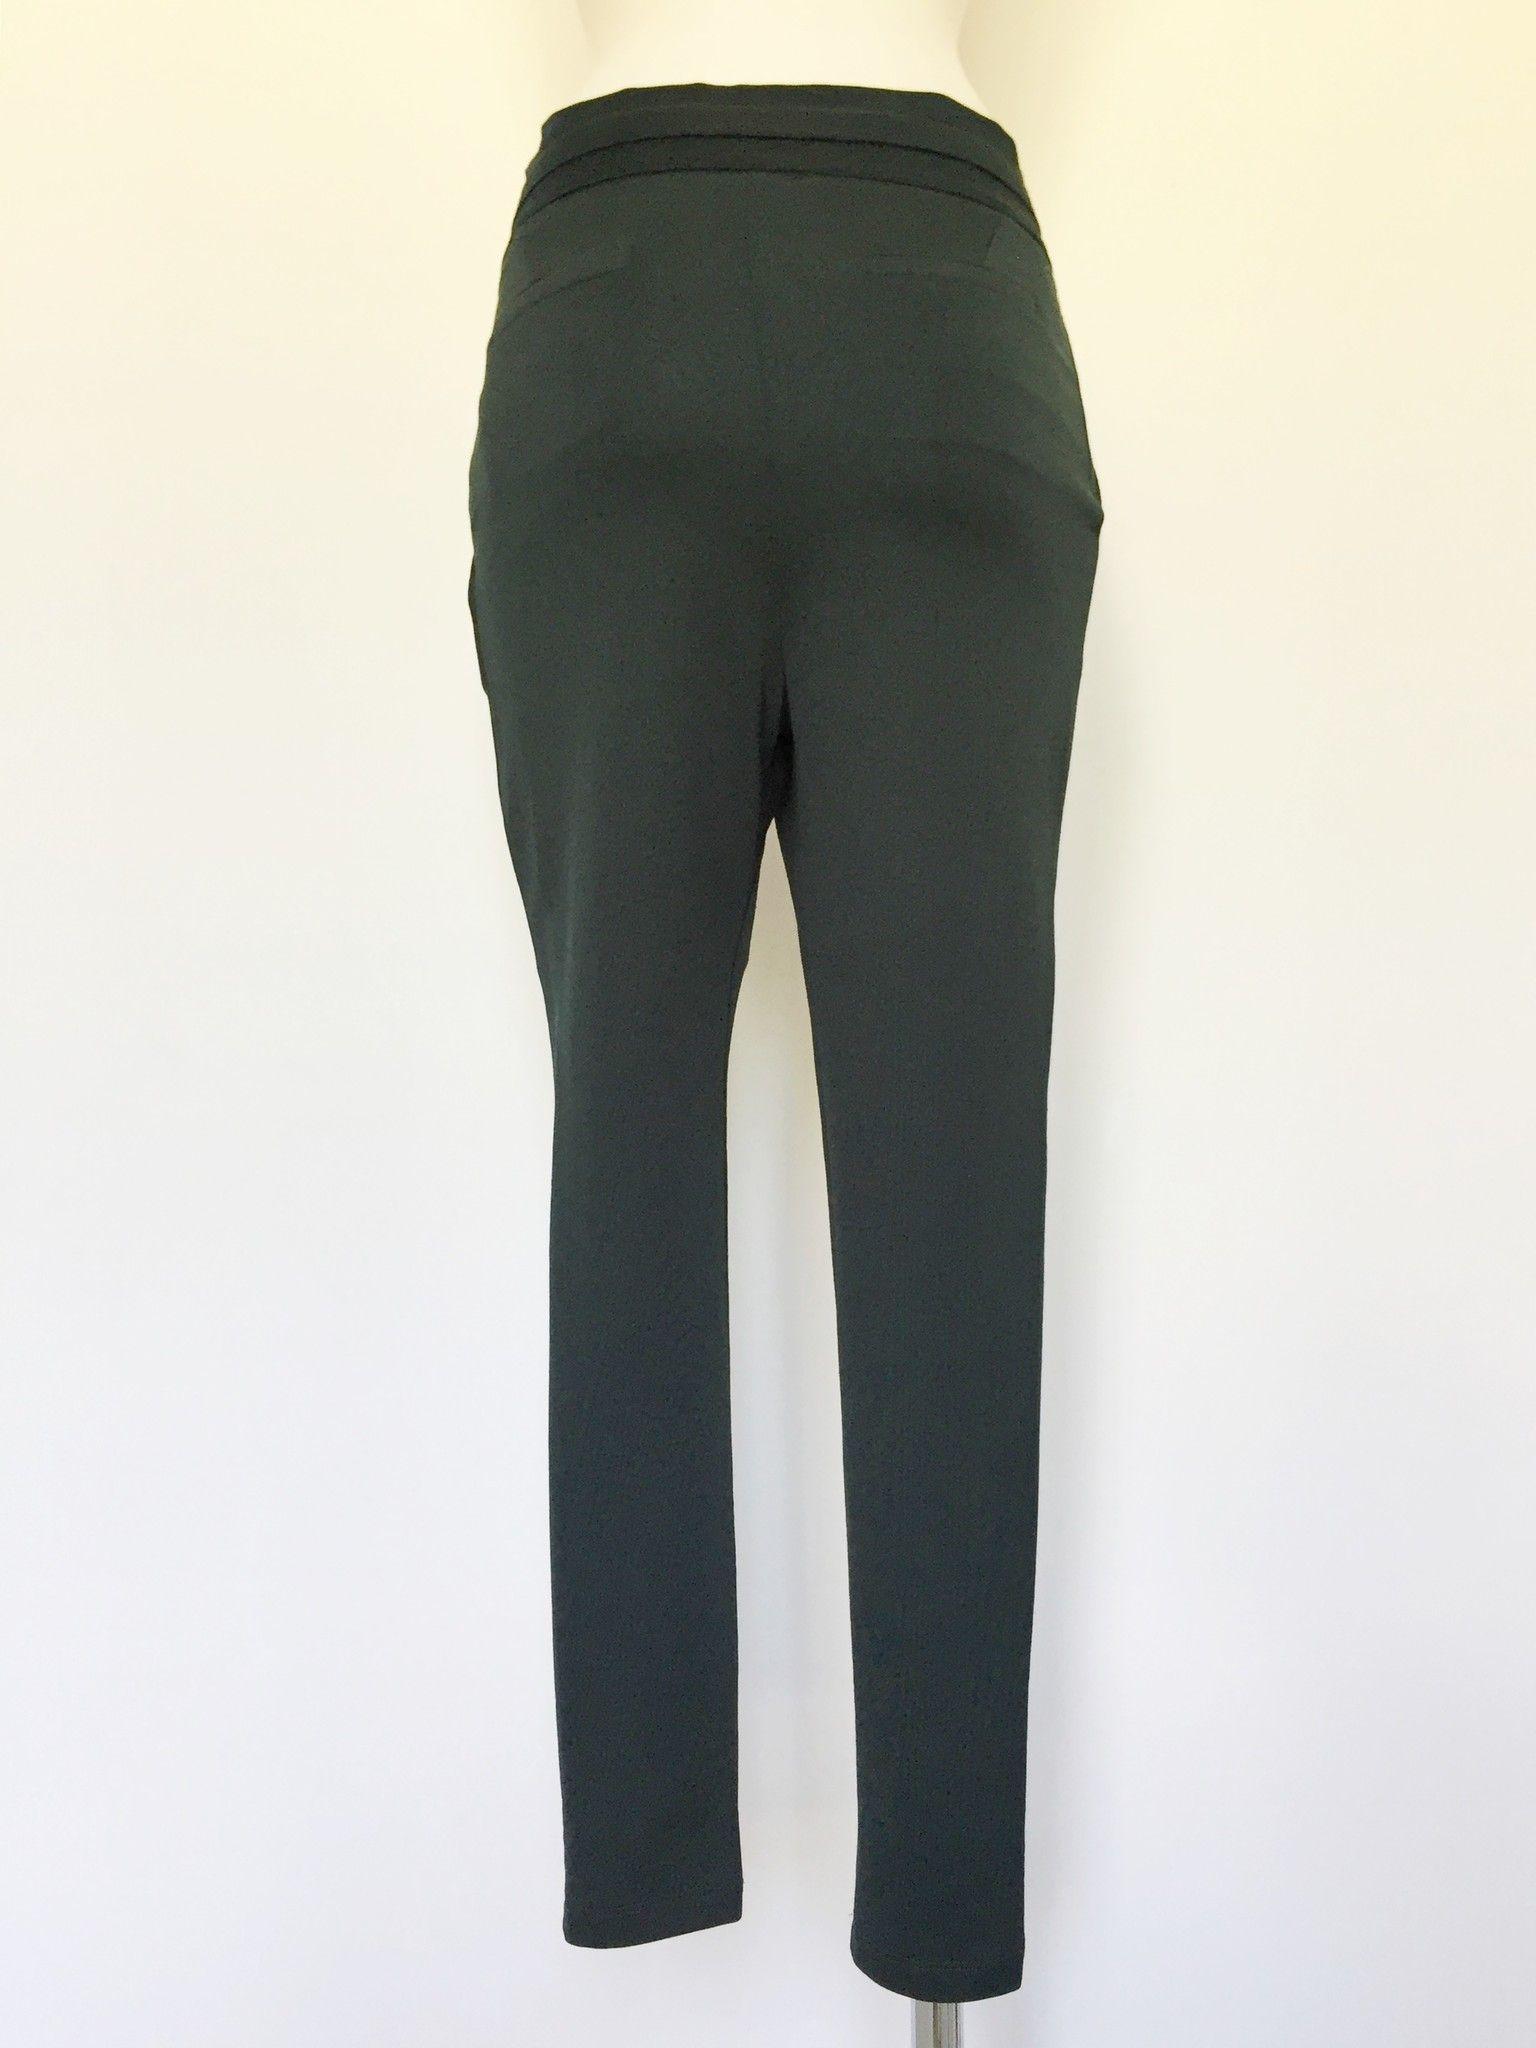 Pantalone Katia G. Lungo Fascia Alta Cod.M594425